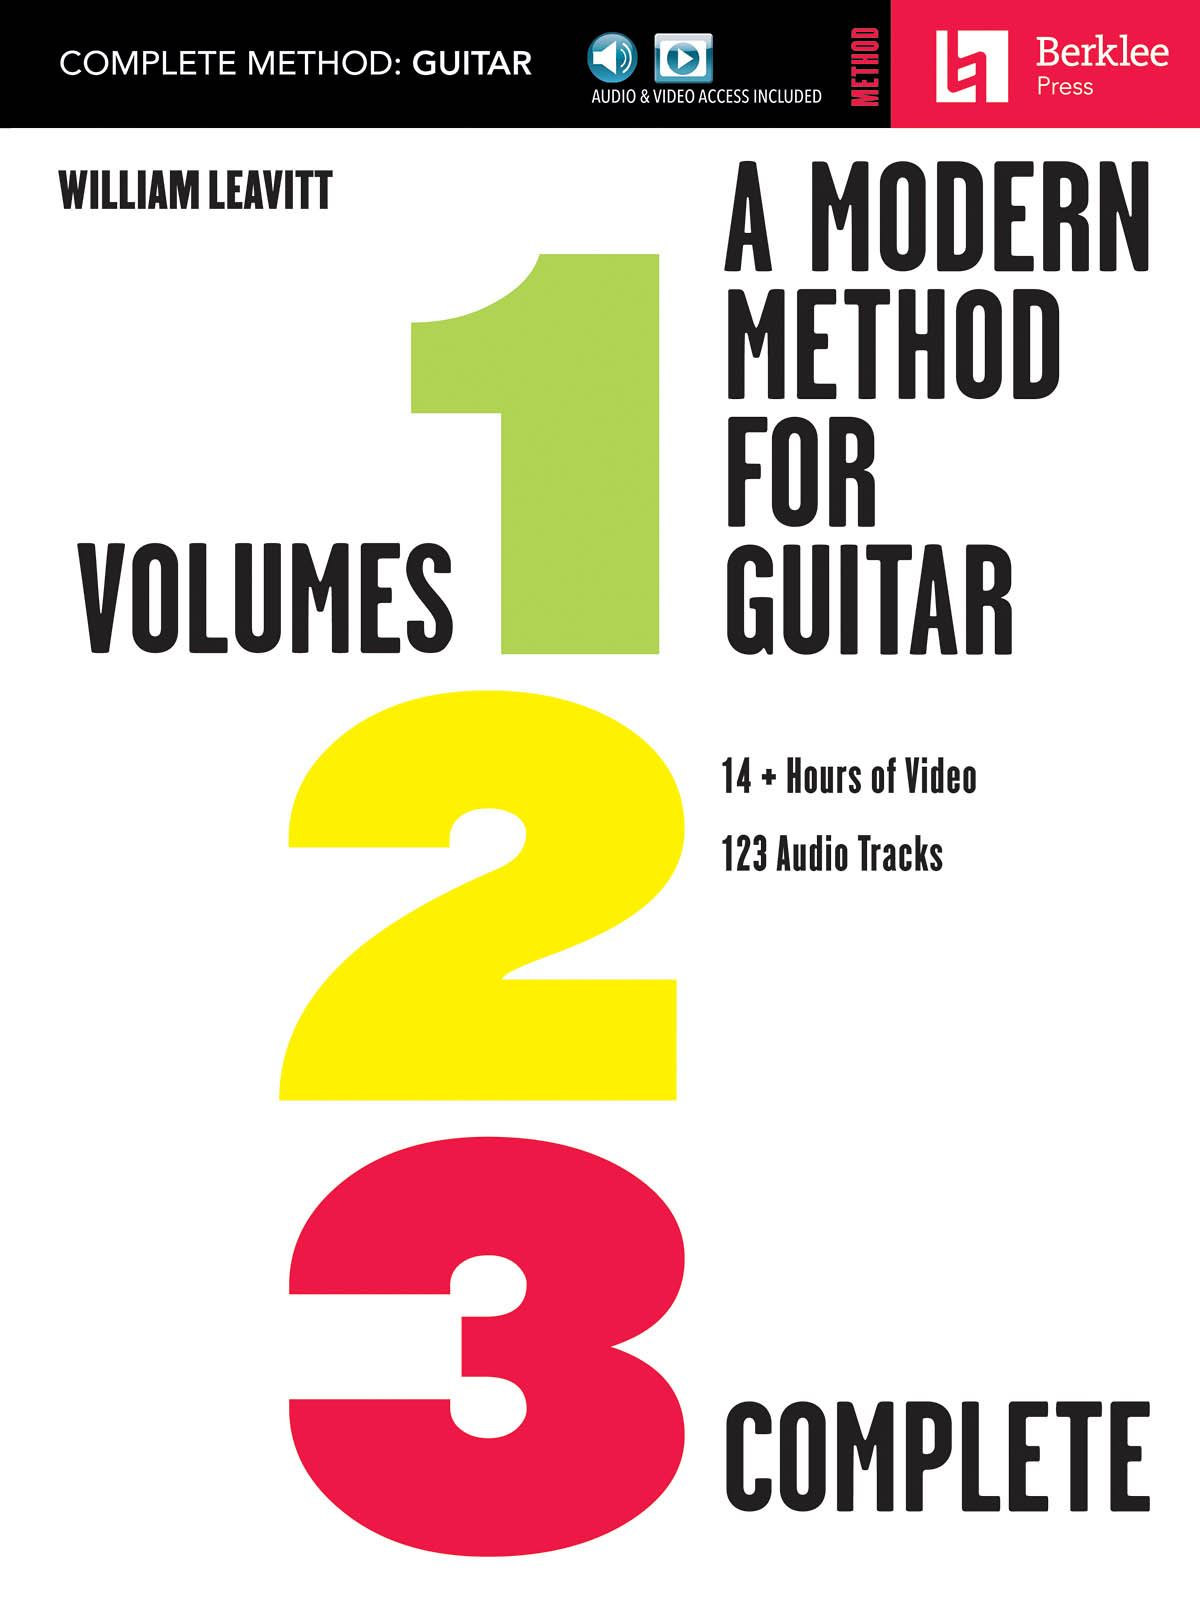 A Modern Method for Guitar - Complete Method: Guitar: Instrumental Tutor